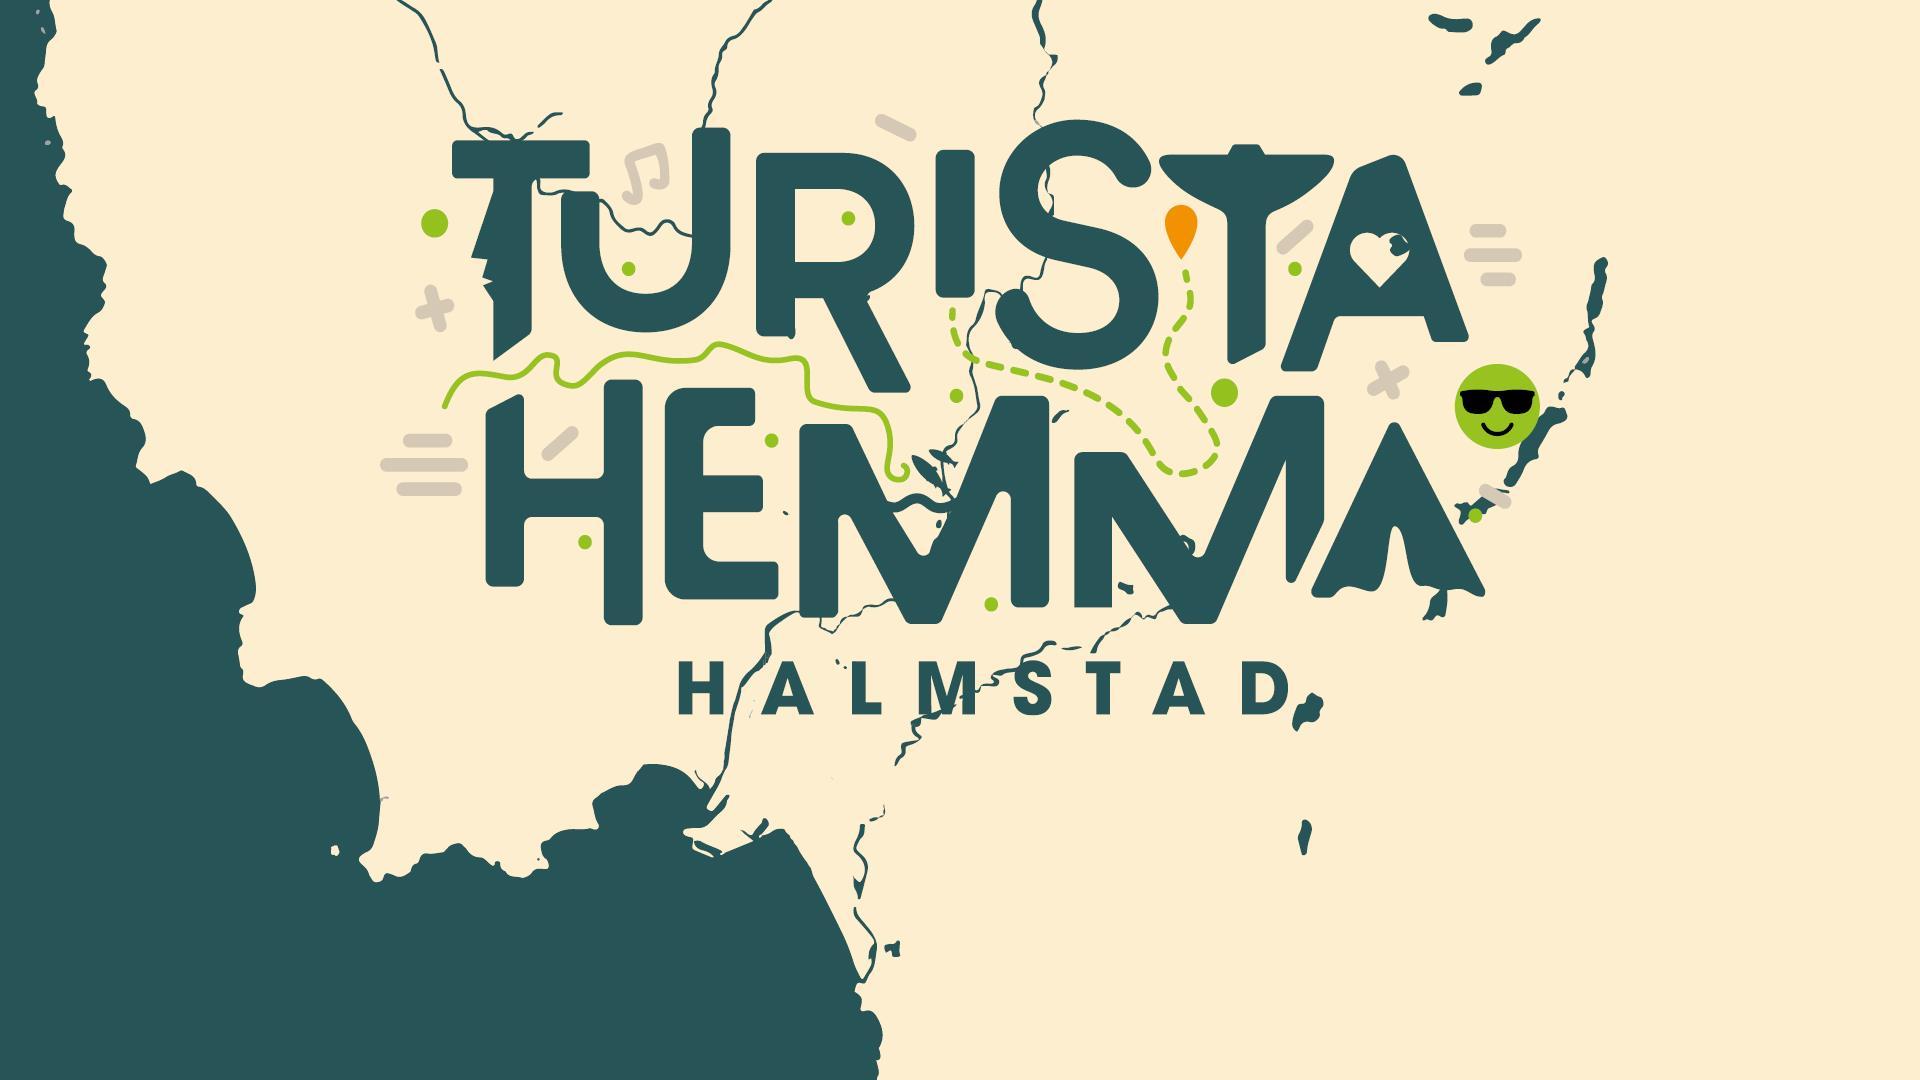 Turista Hemma Halmstad 15/6-31/8 2020